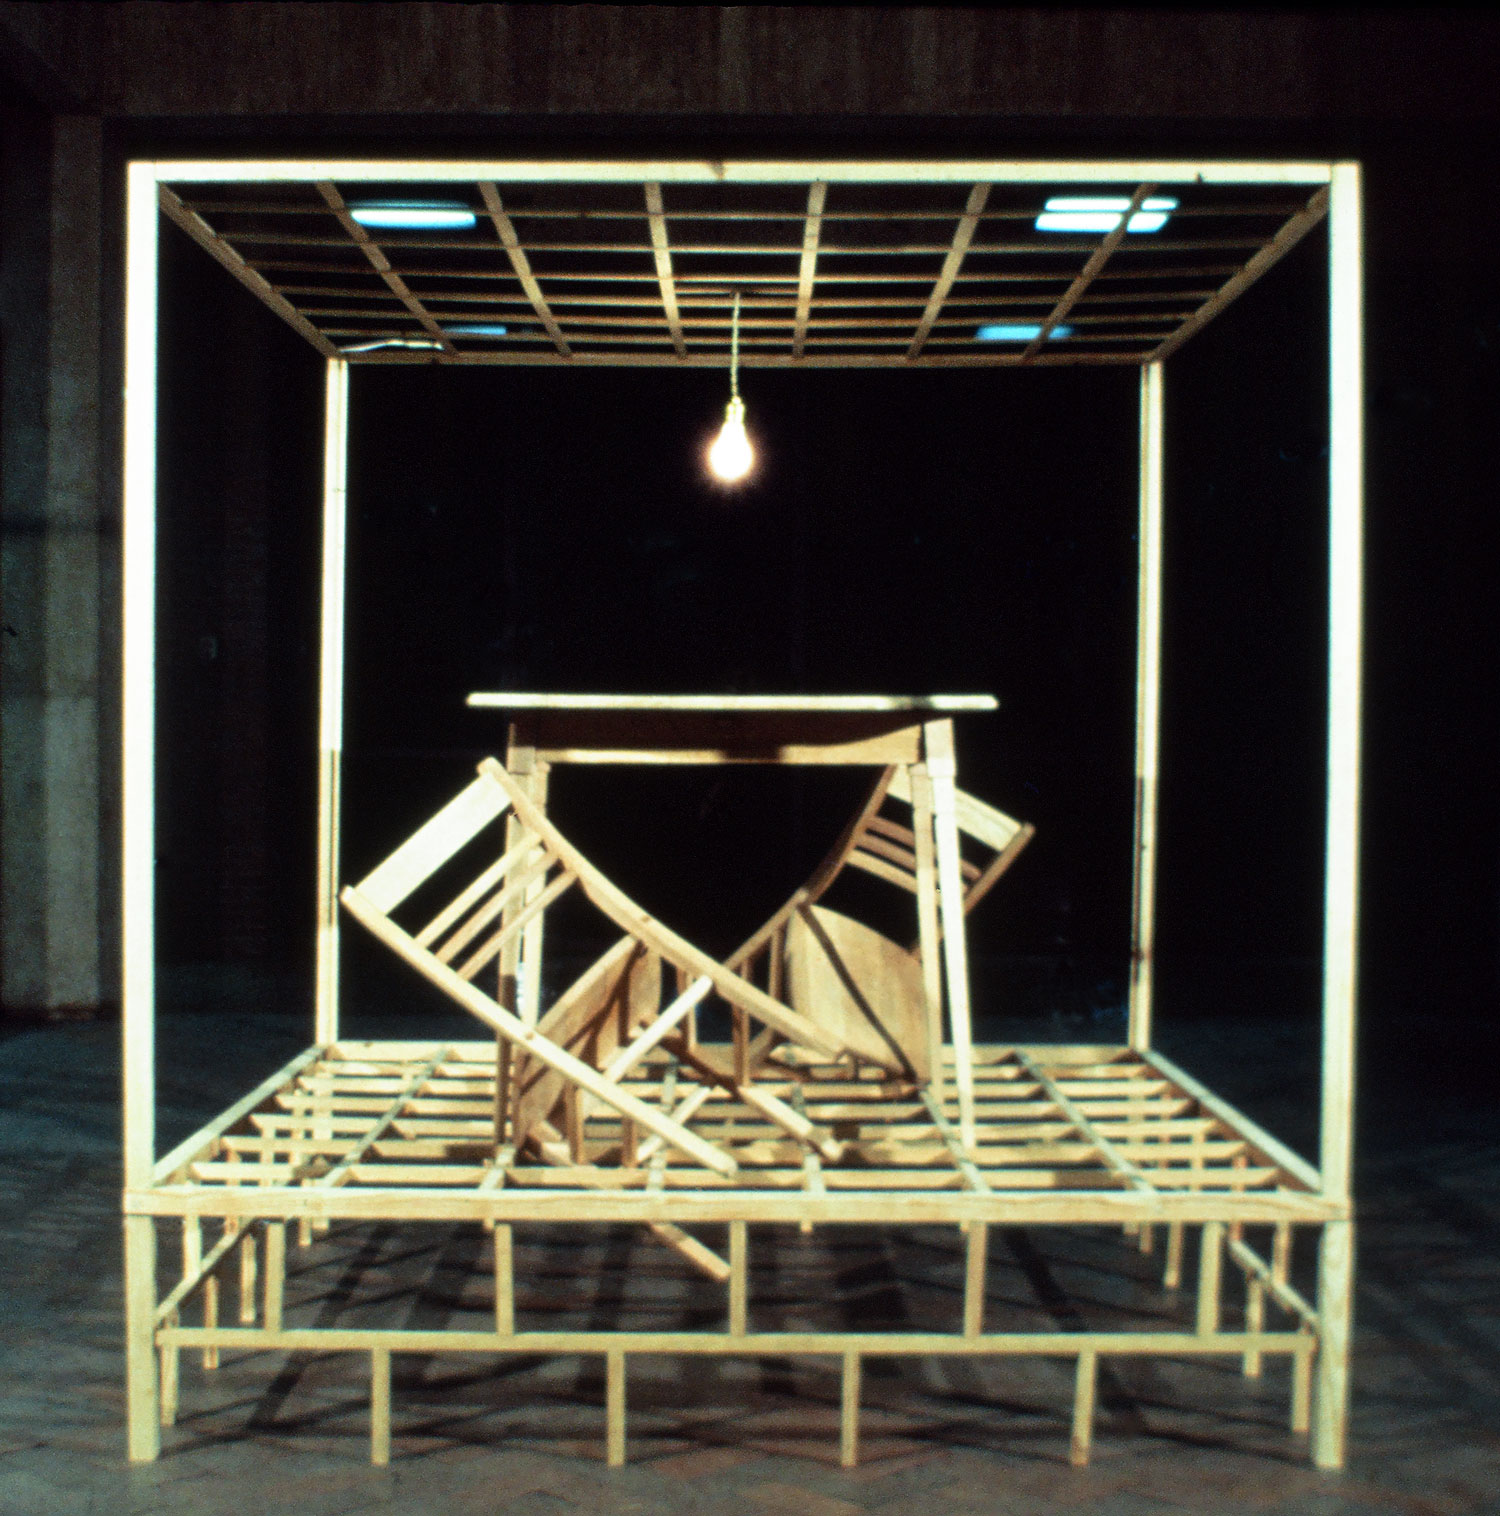 wood-sculpture-mainspring-monument-artist-tom-gormally.jpg